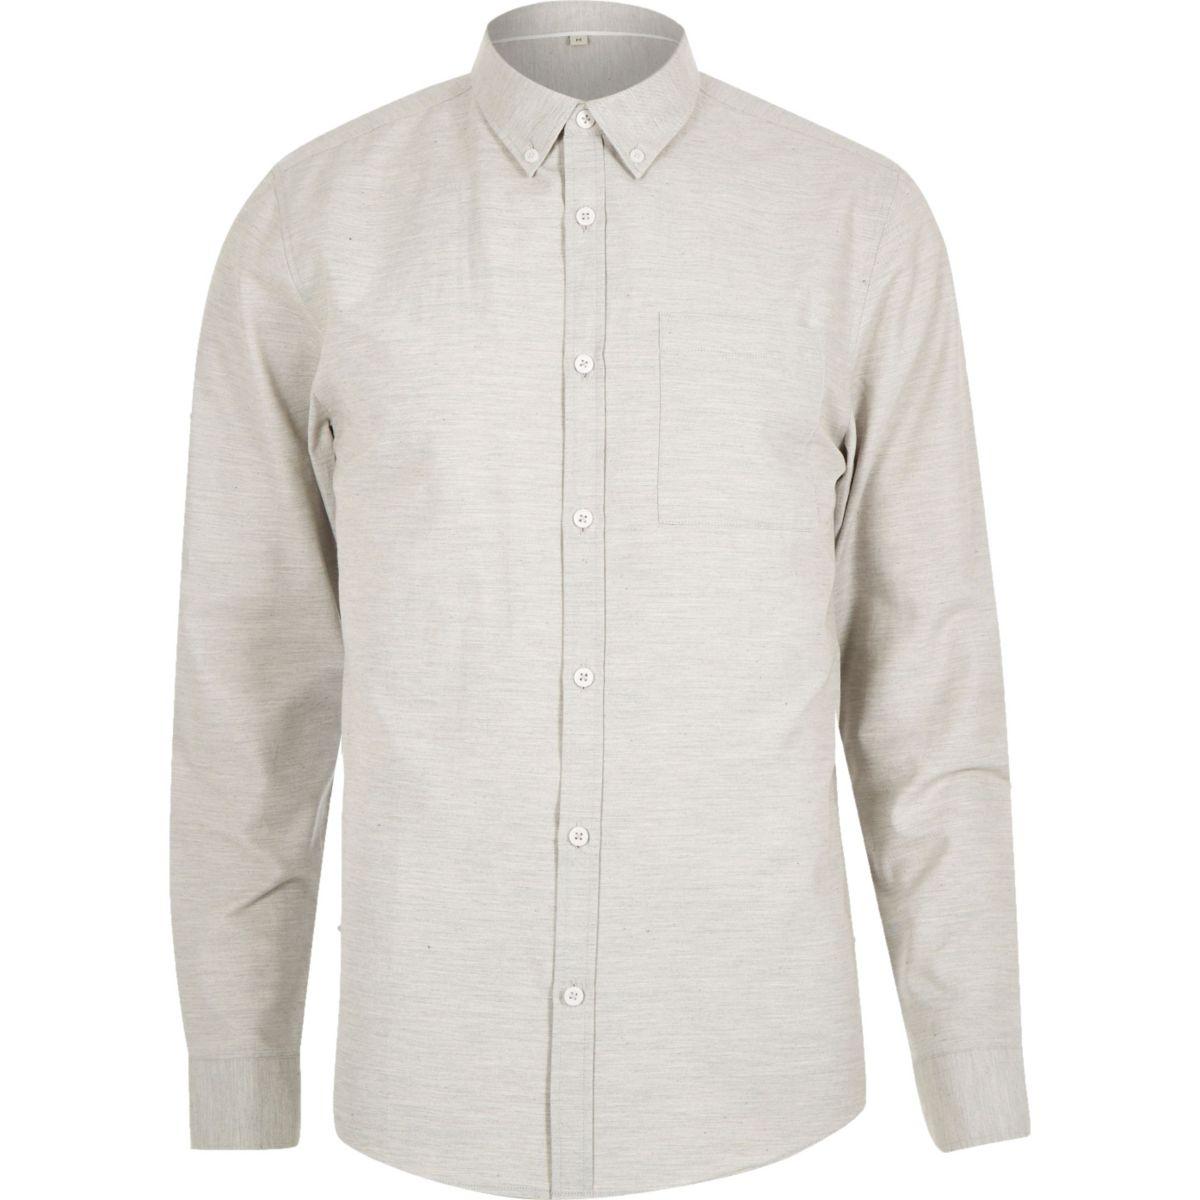 Grey marl long sleeve shirt